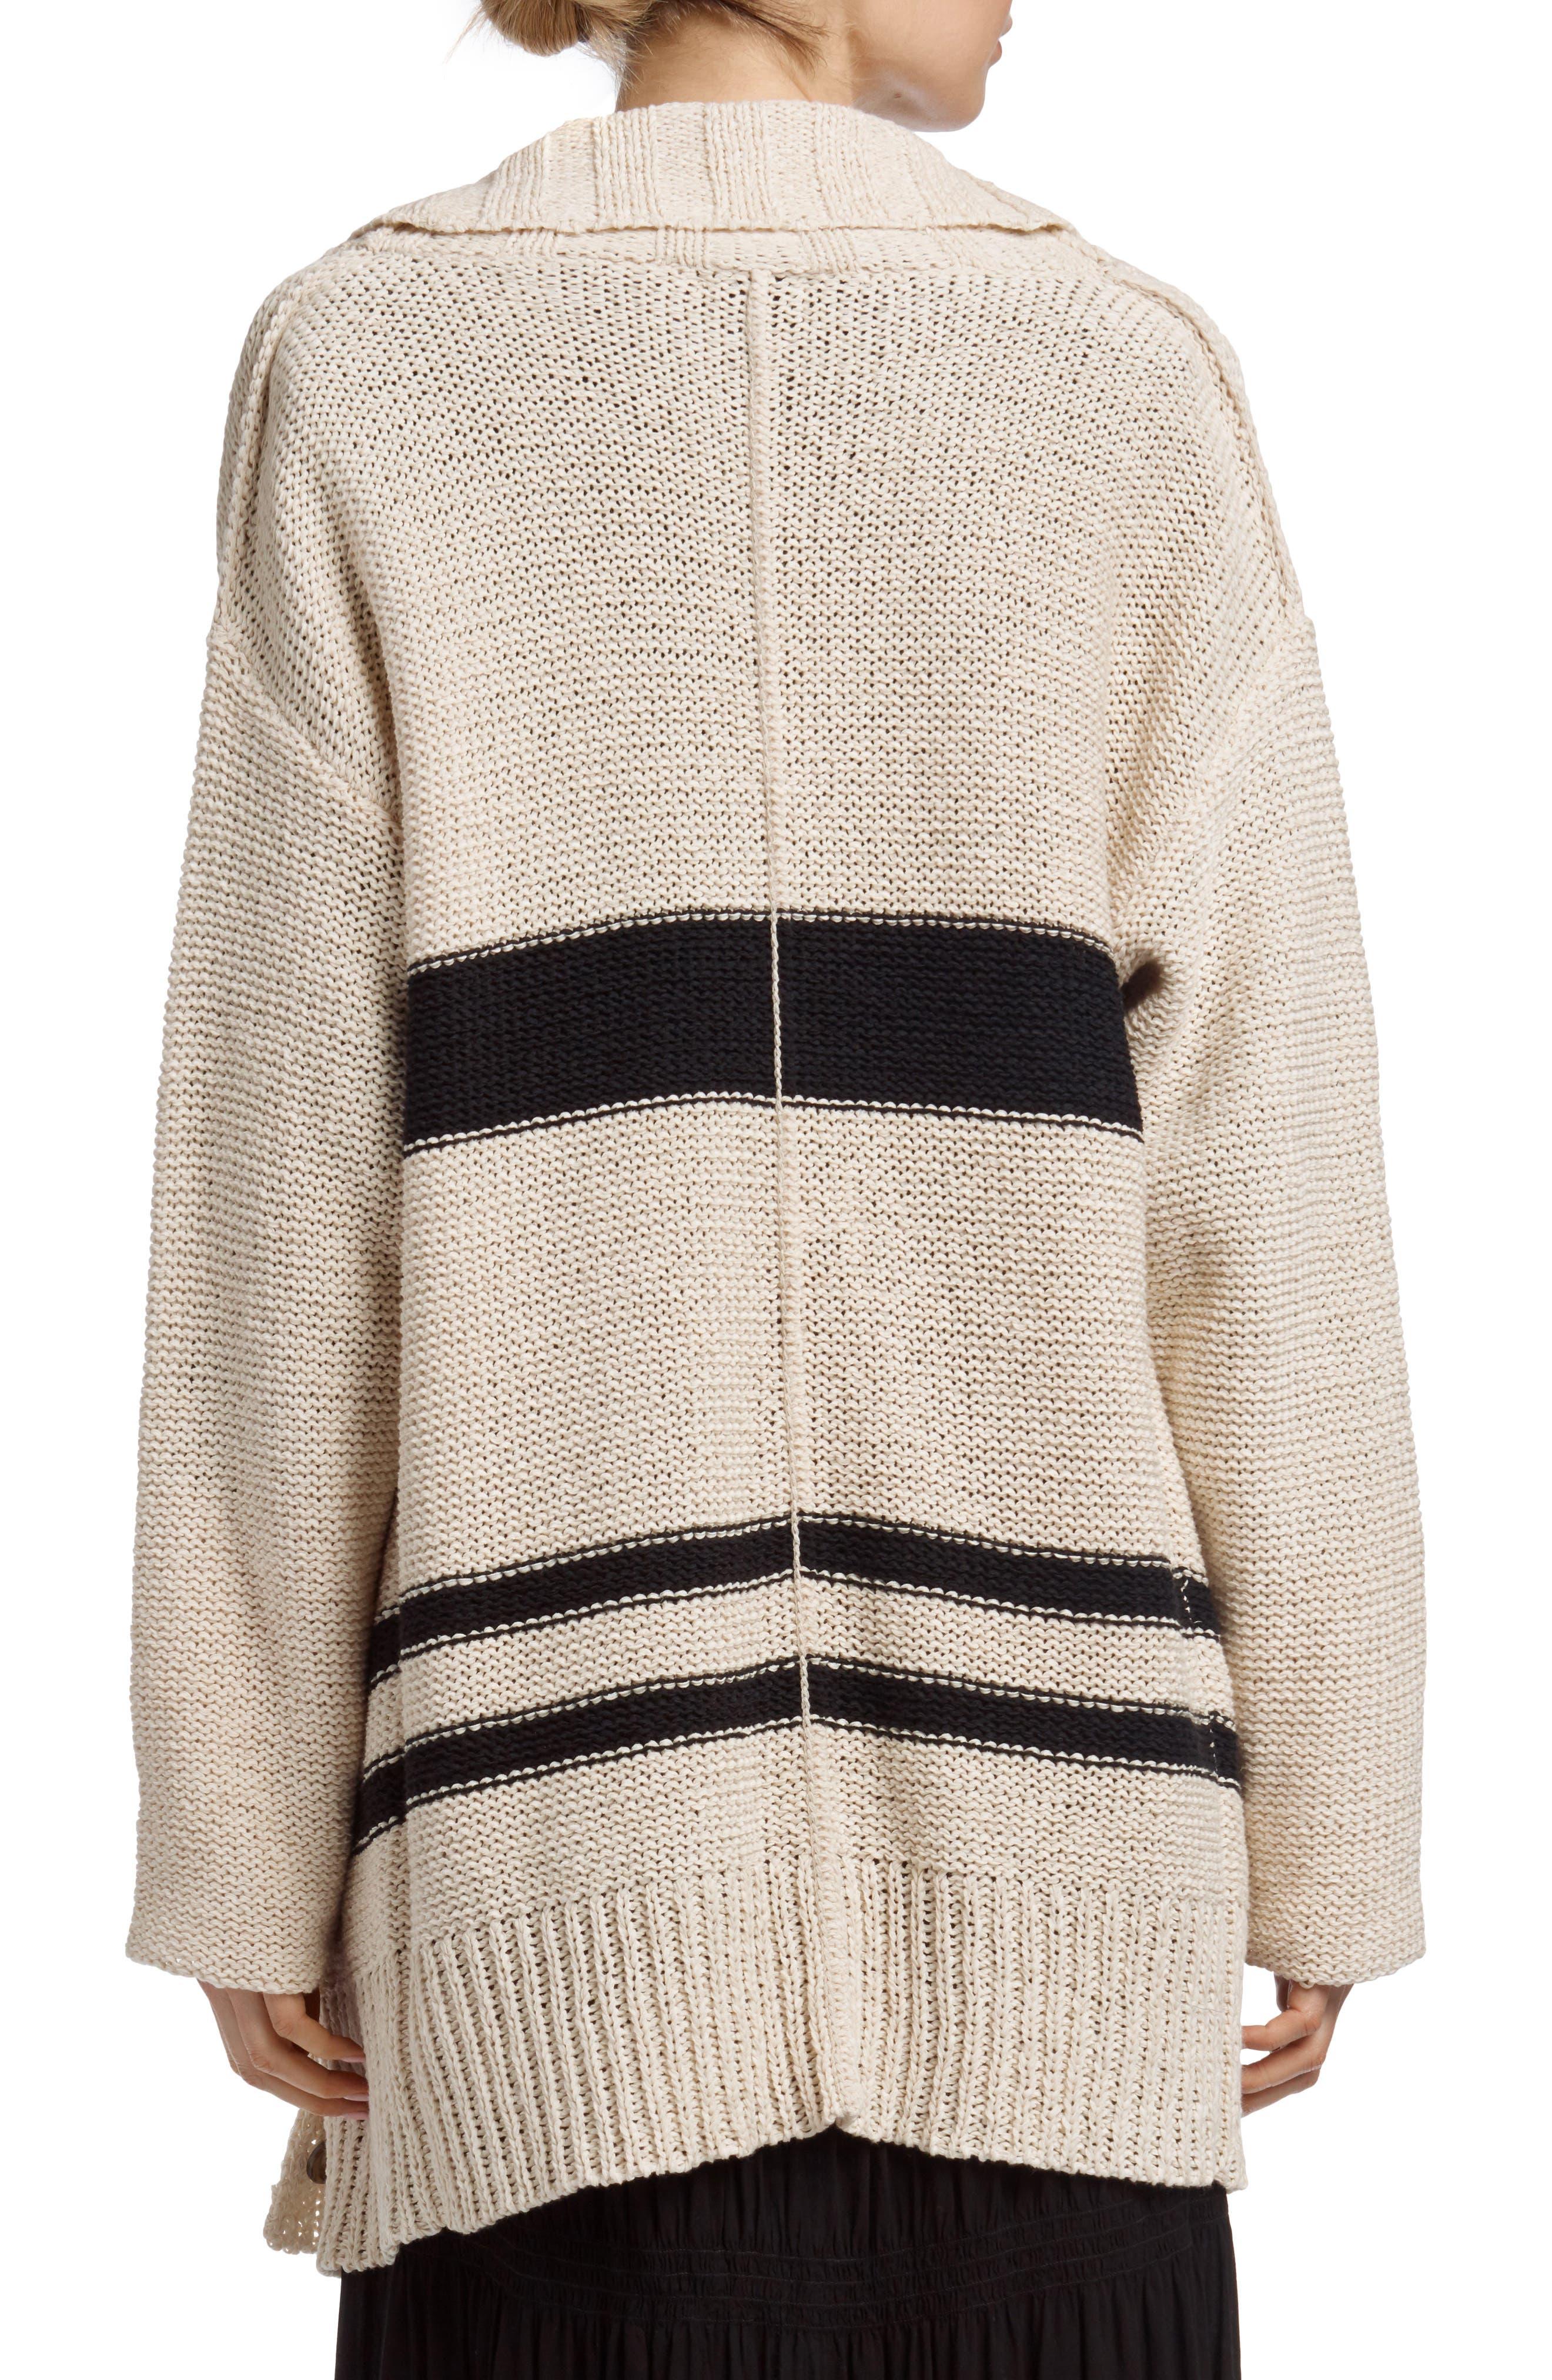 Cotton & Linen Blend Beach Sweater,                             Alternate thumbnail 2, color,                             250